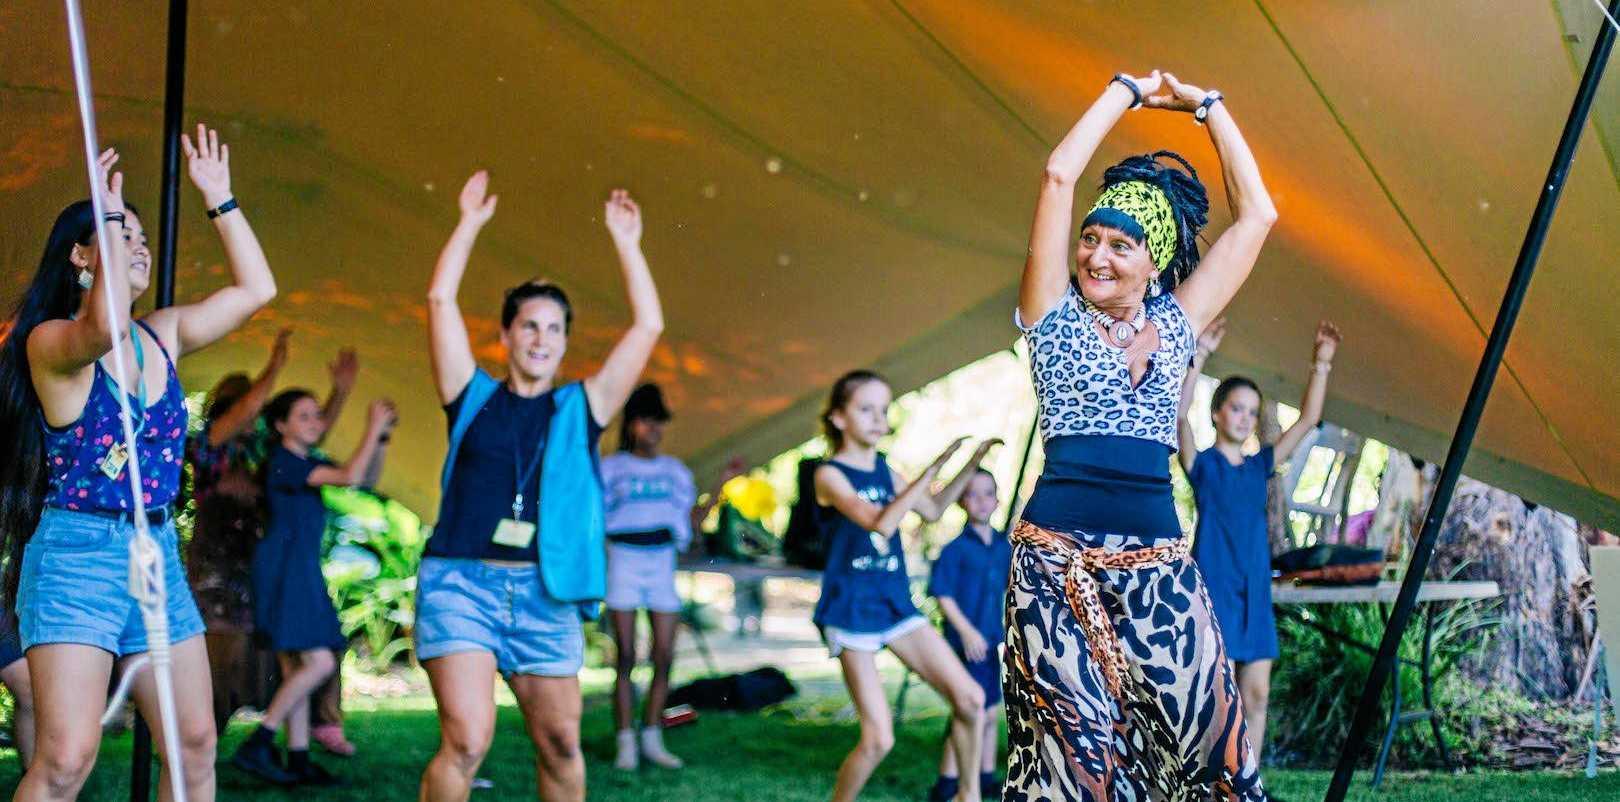 PERFECT HARMONY: Maitoumbi in action leading festival-goers at last year's Harmony Festival.